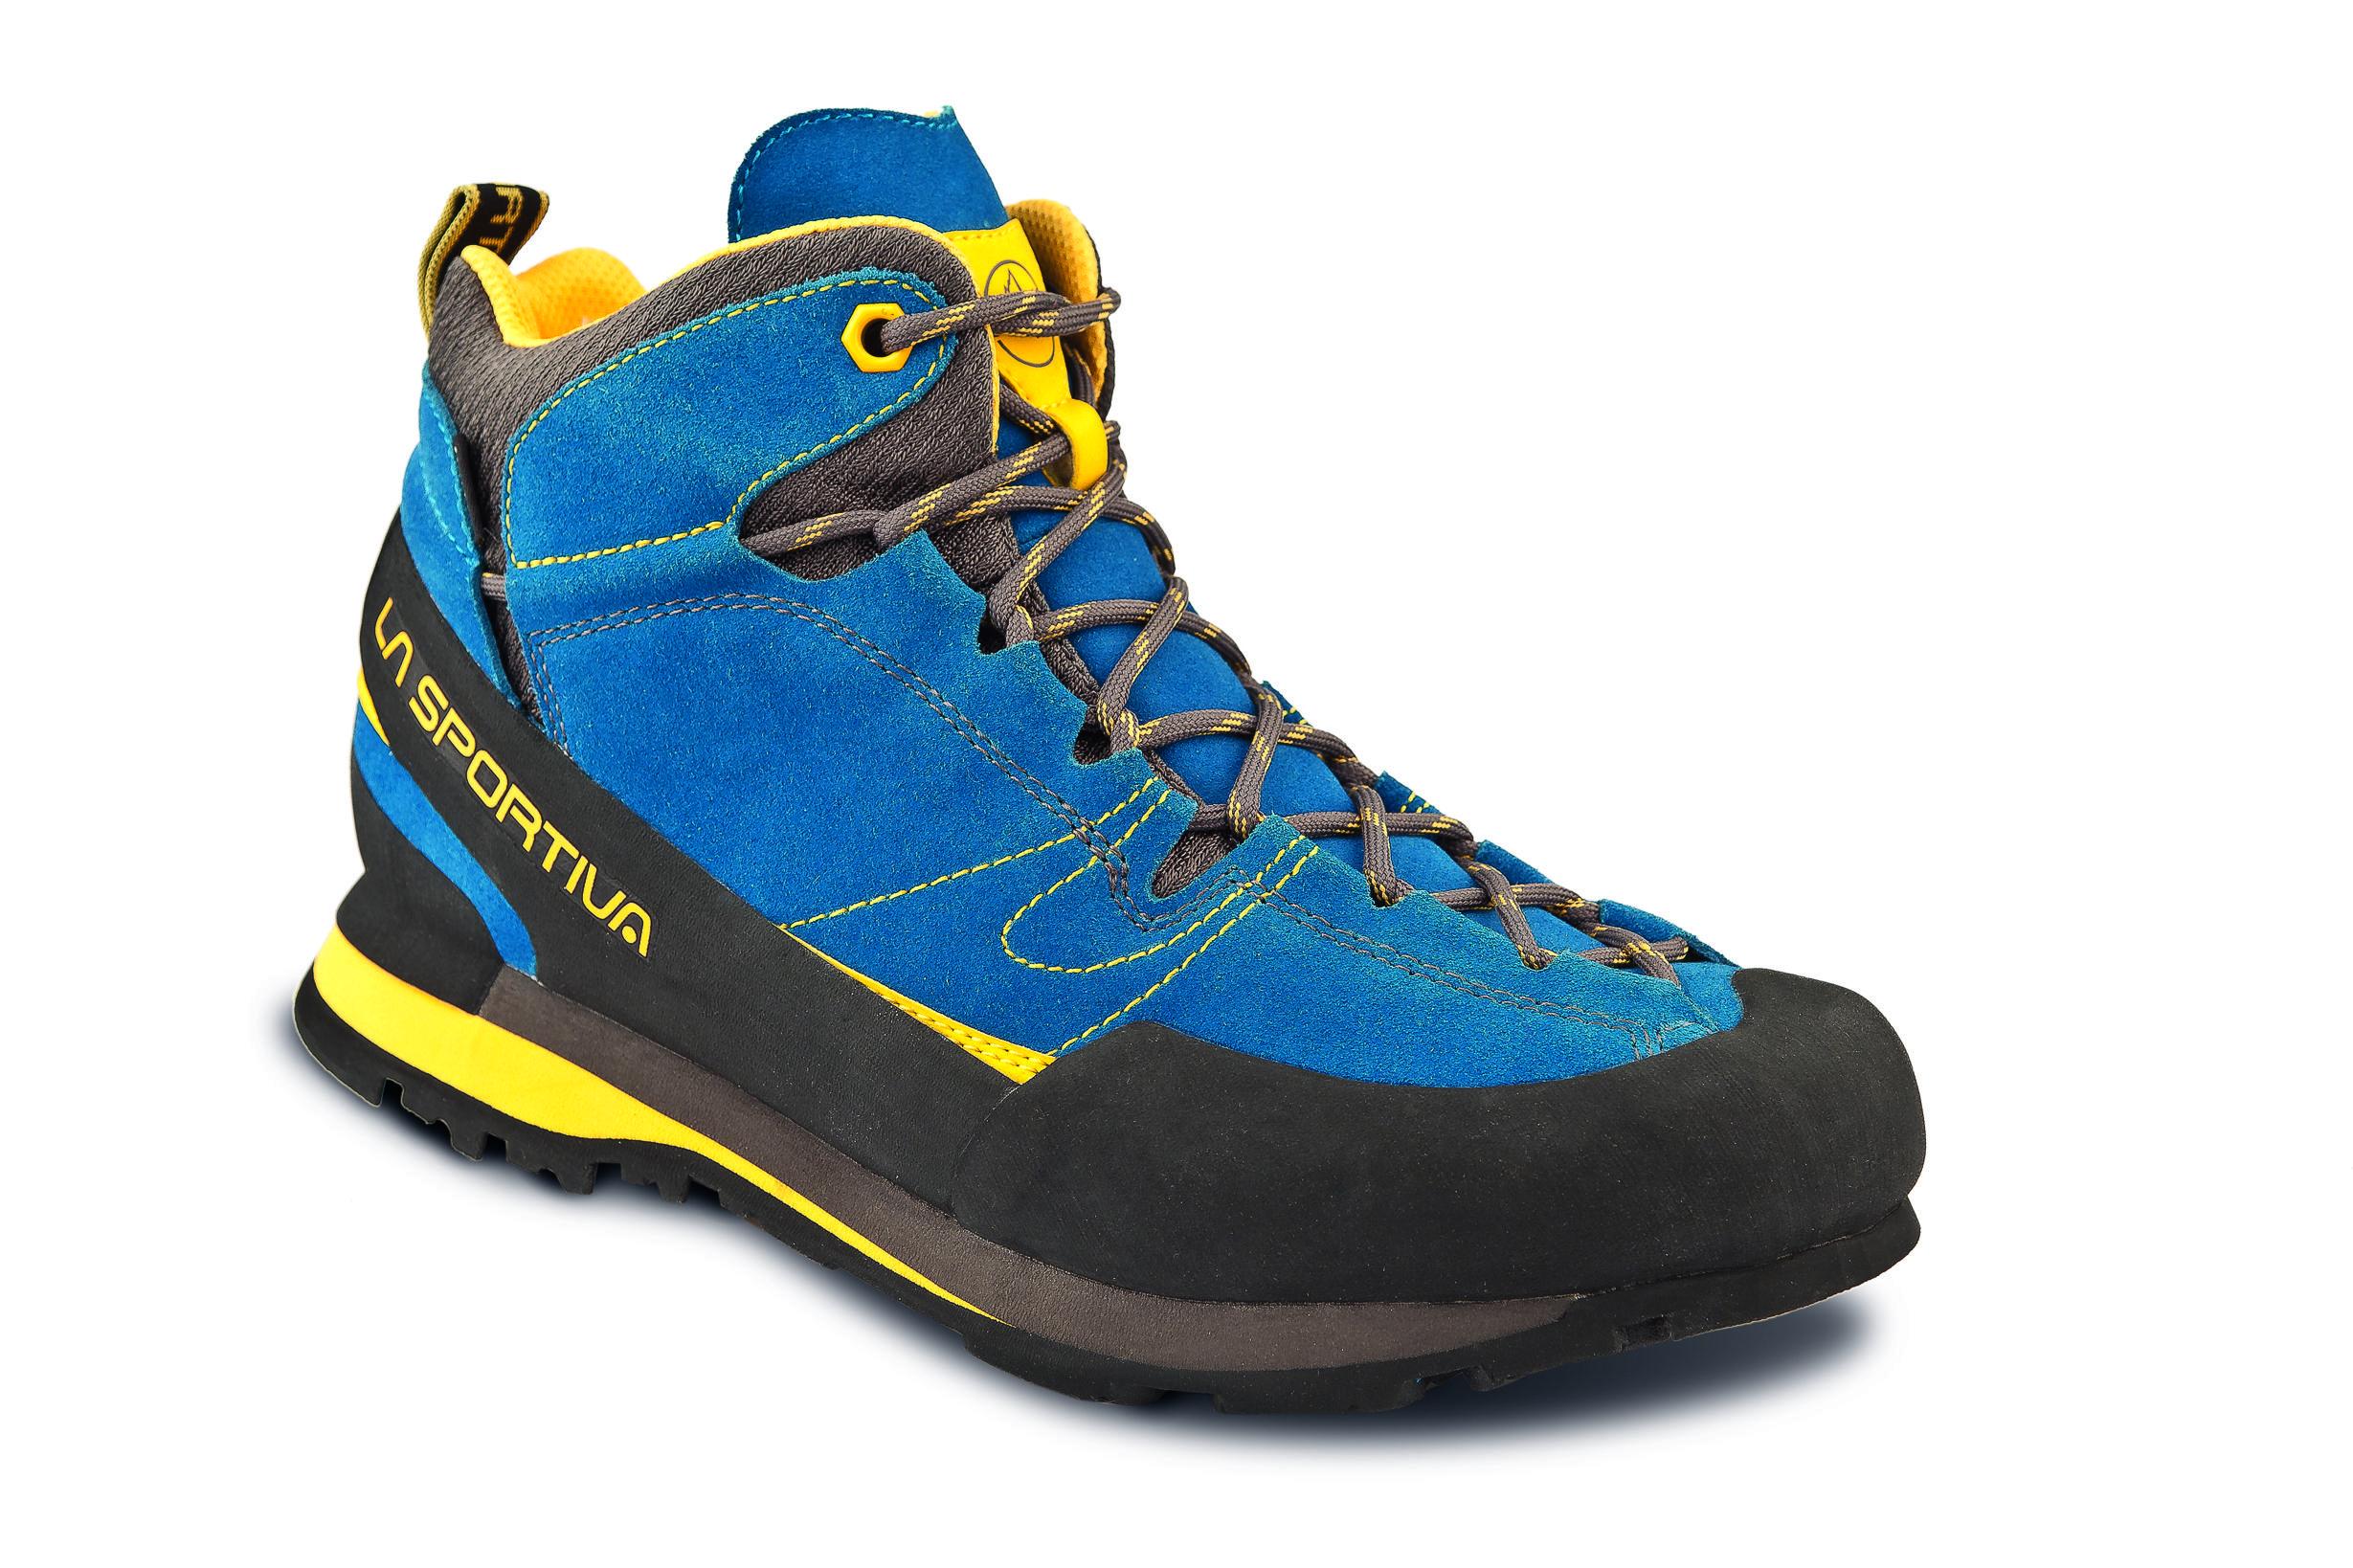 la sportiva boulder x mid blue yellow ute sneakers. Black Bedroom Furniture Sets. Home Design Ideas